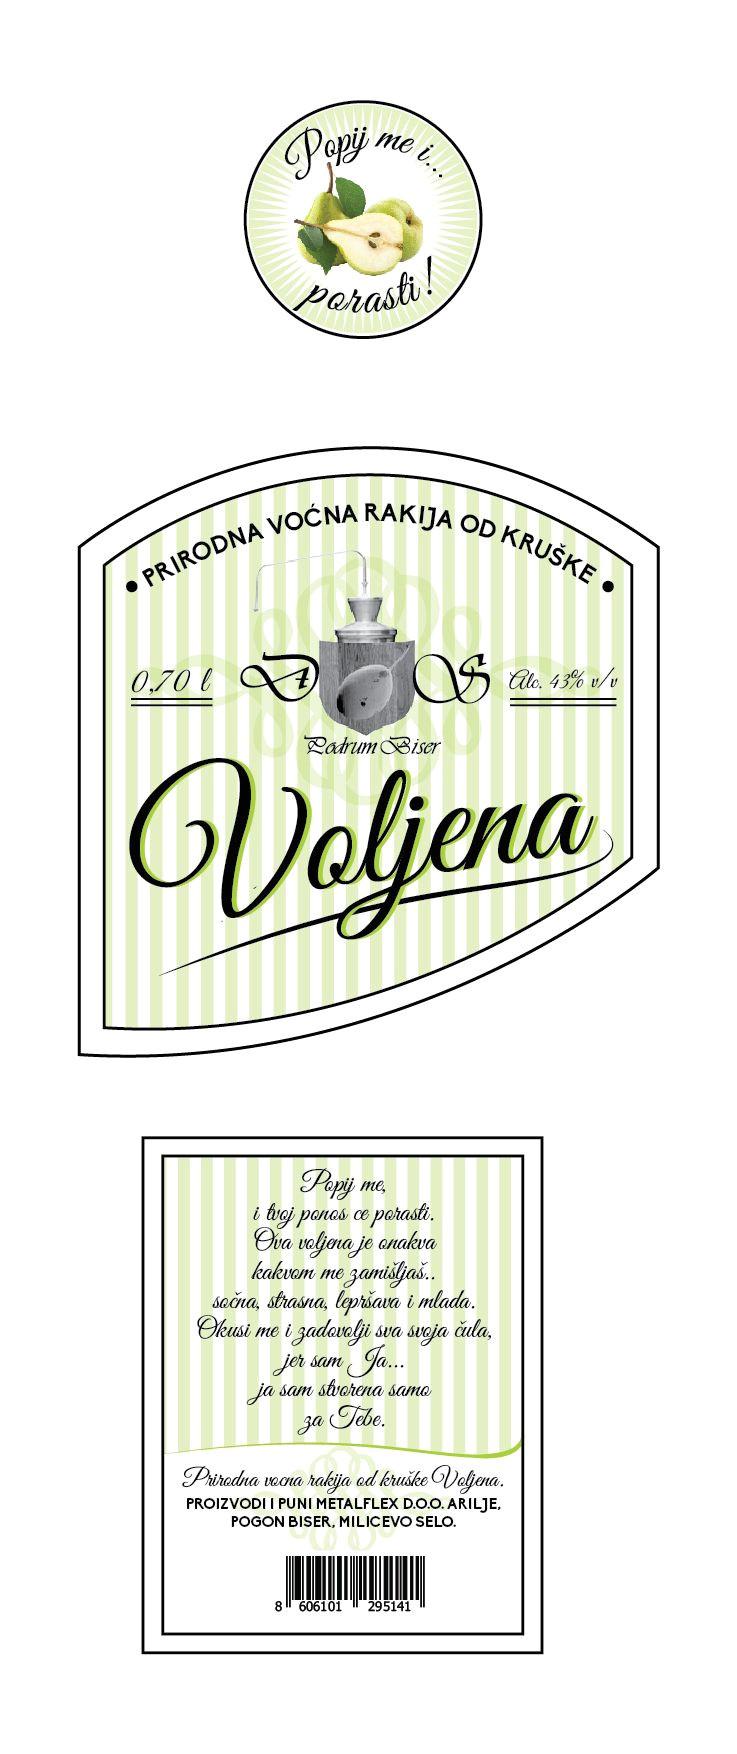 Blank Fillable social Security Card Template Zlatna Biserka Rakije social Security Card social